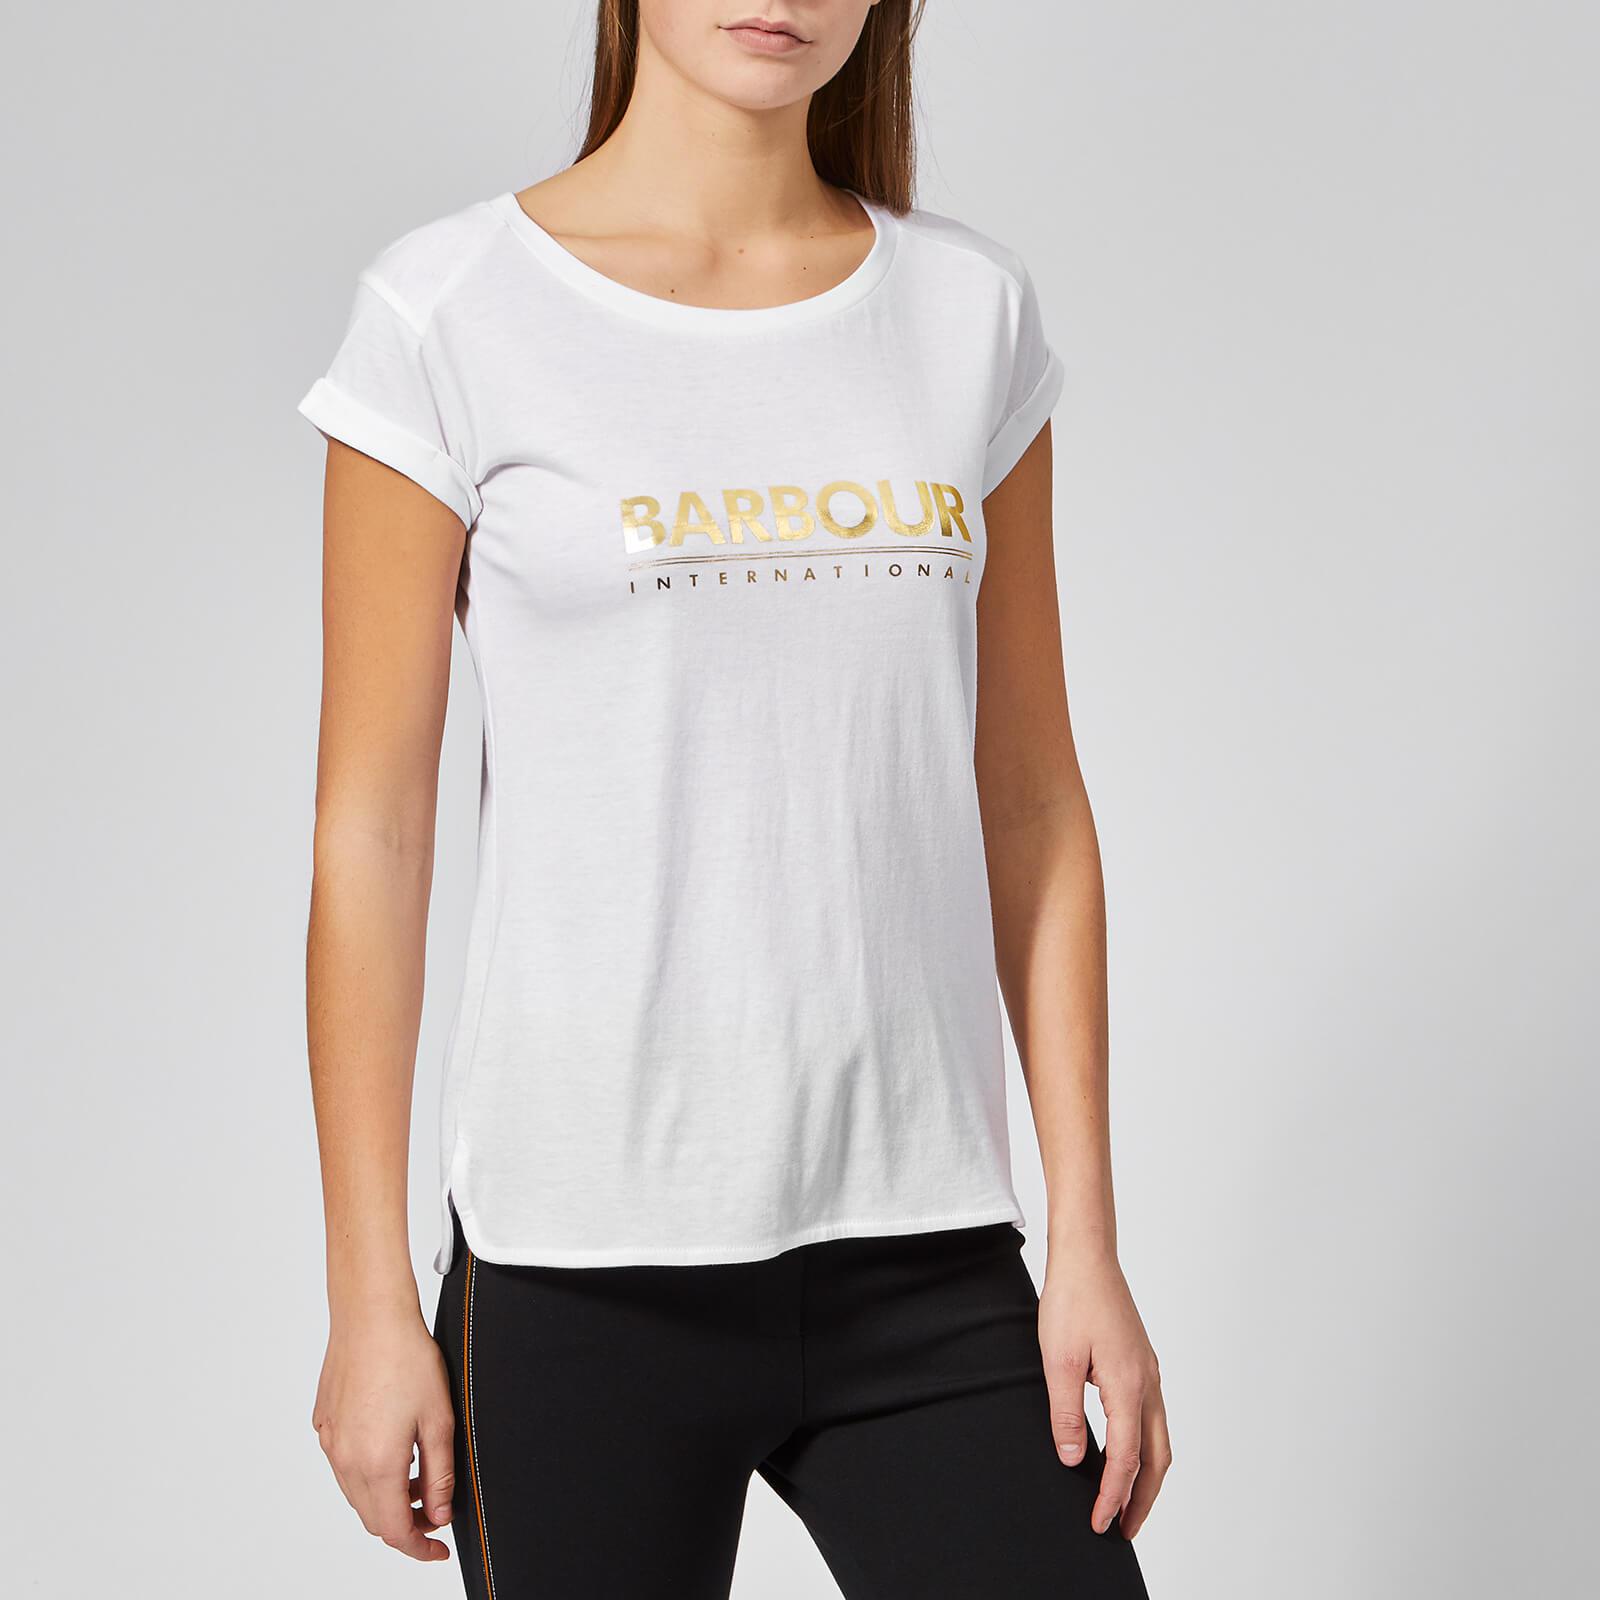 Barbour International Women's Court T-Shirt - White - UK 10 - White